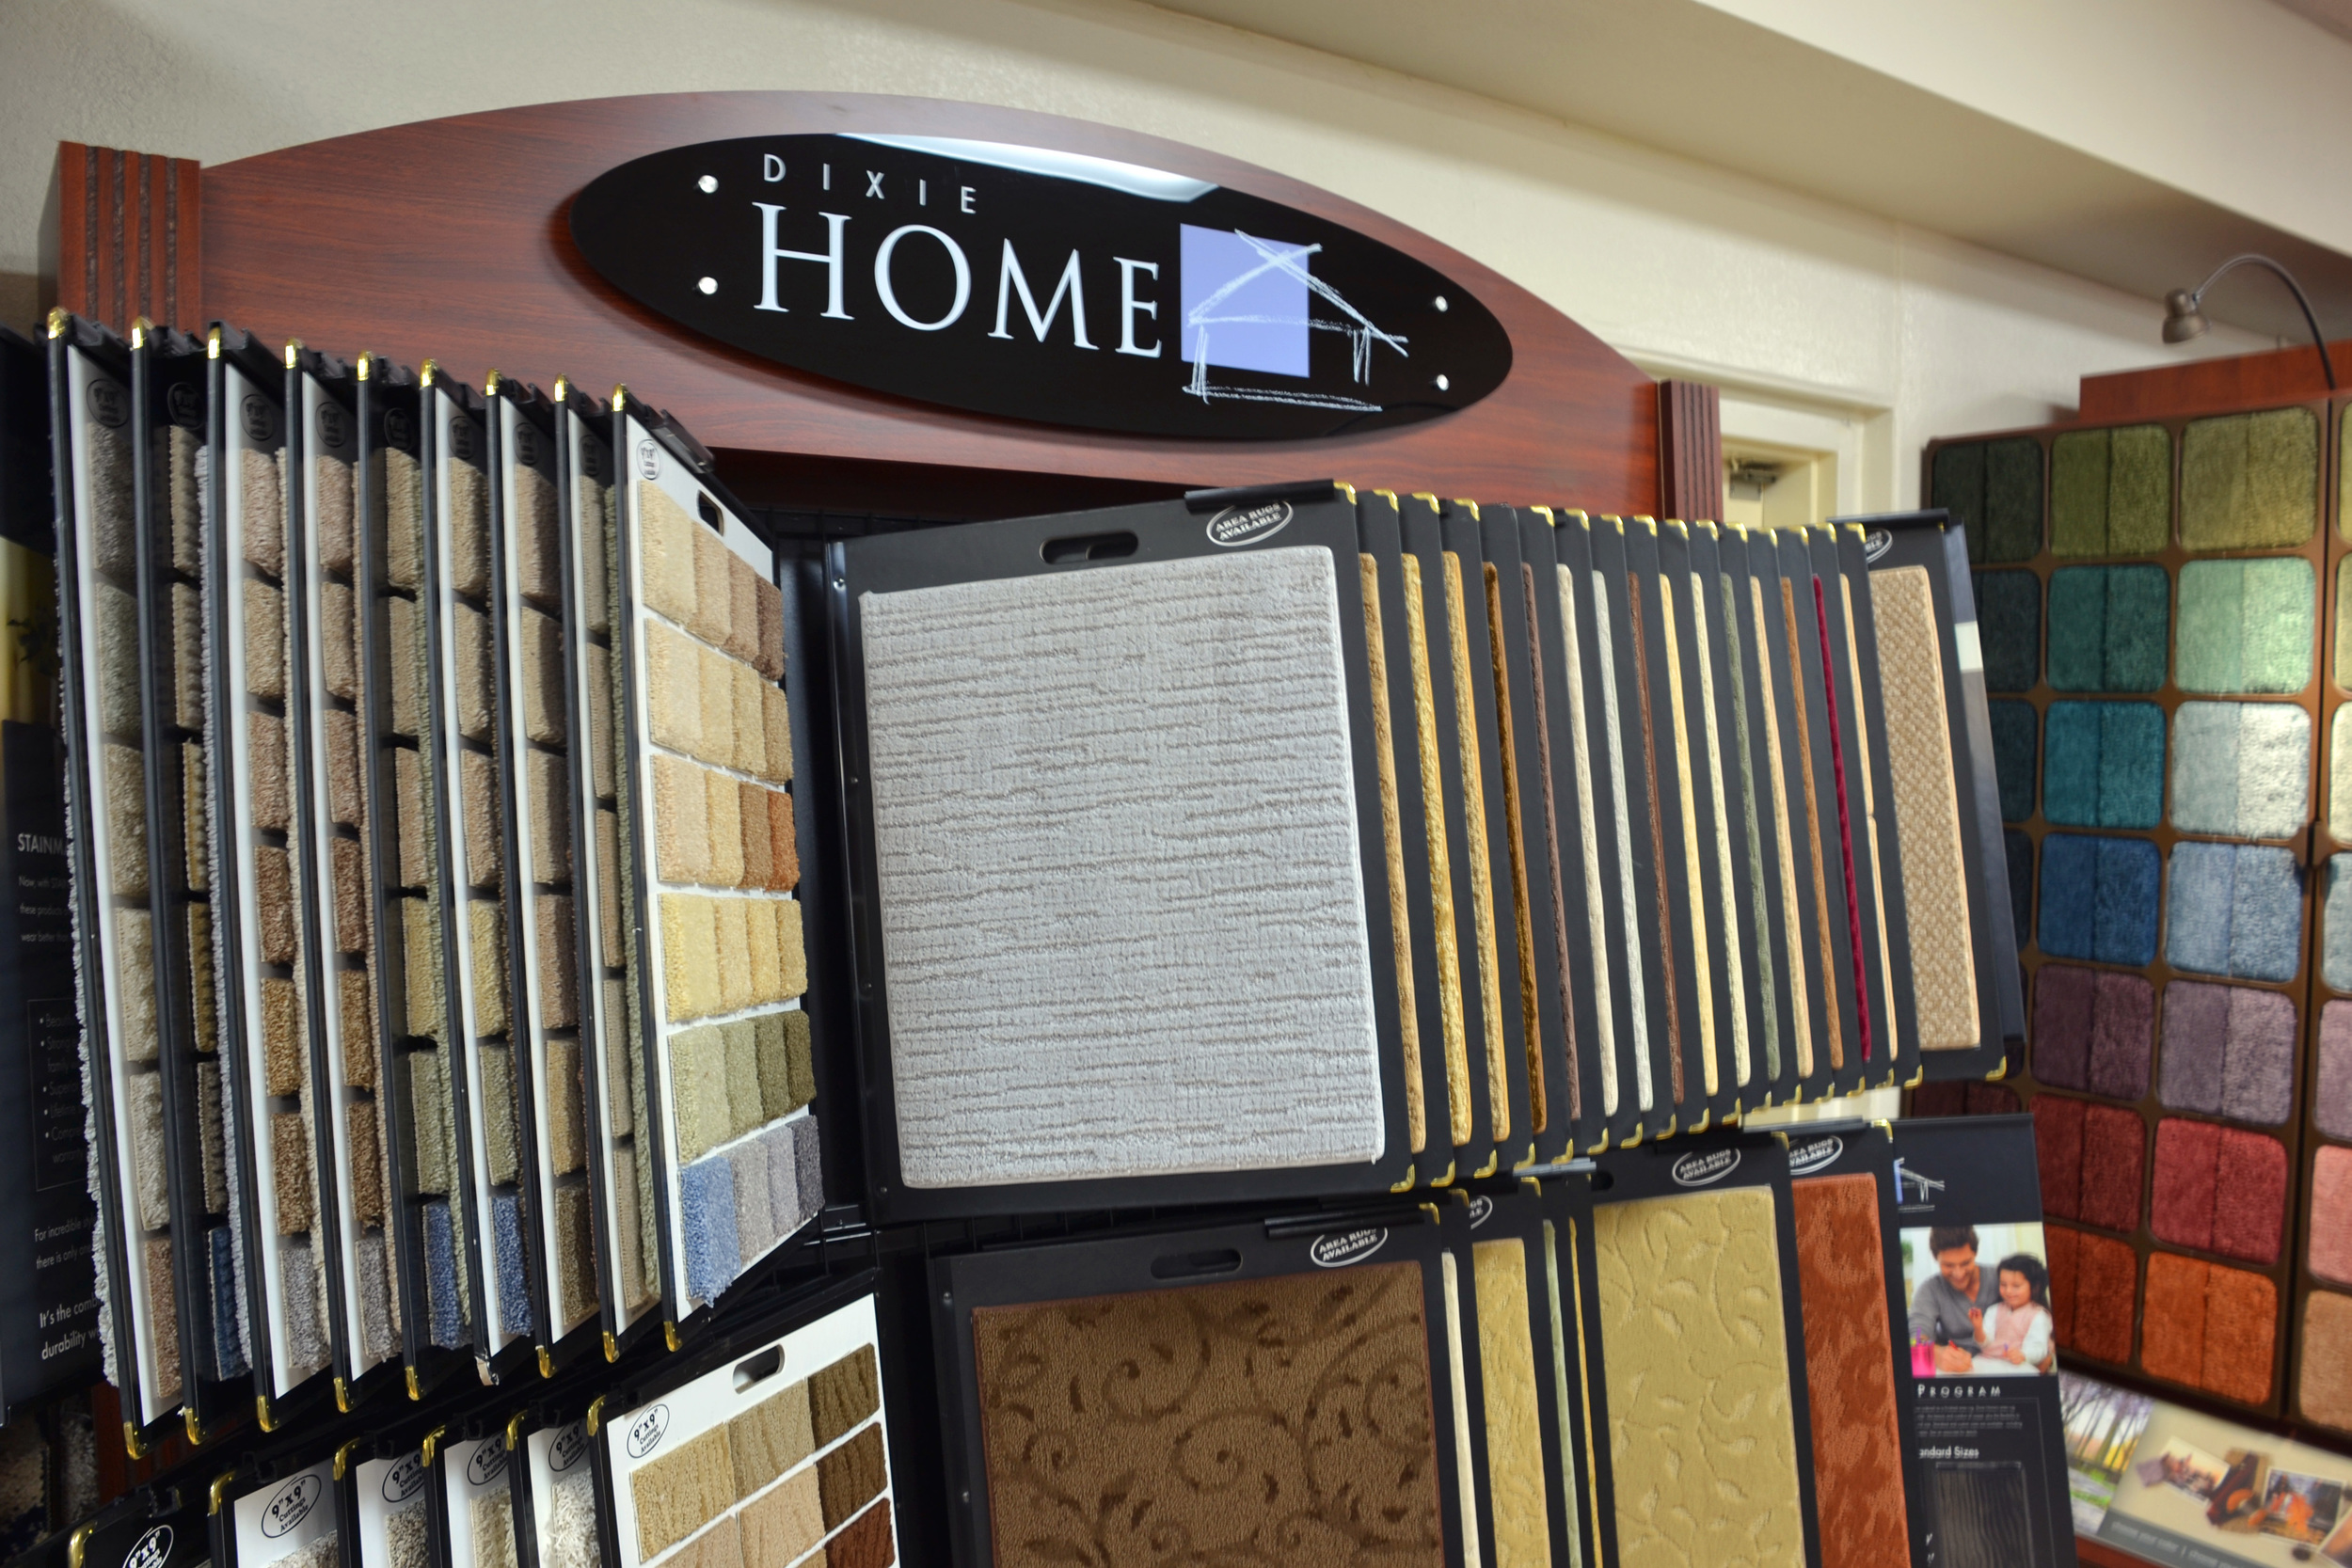 display-dixie-home.jpg